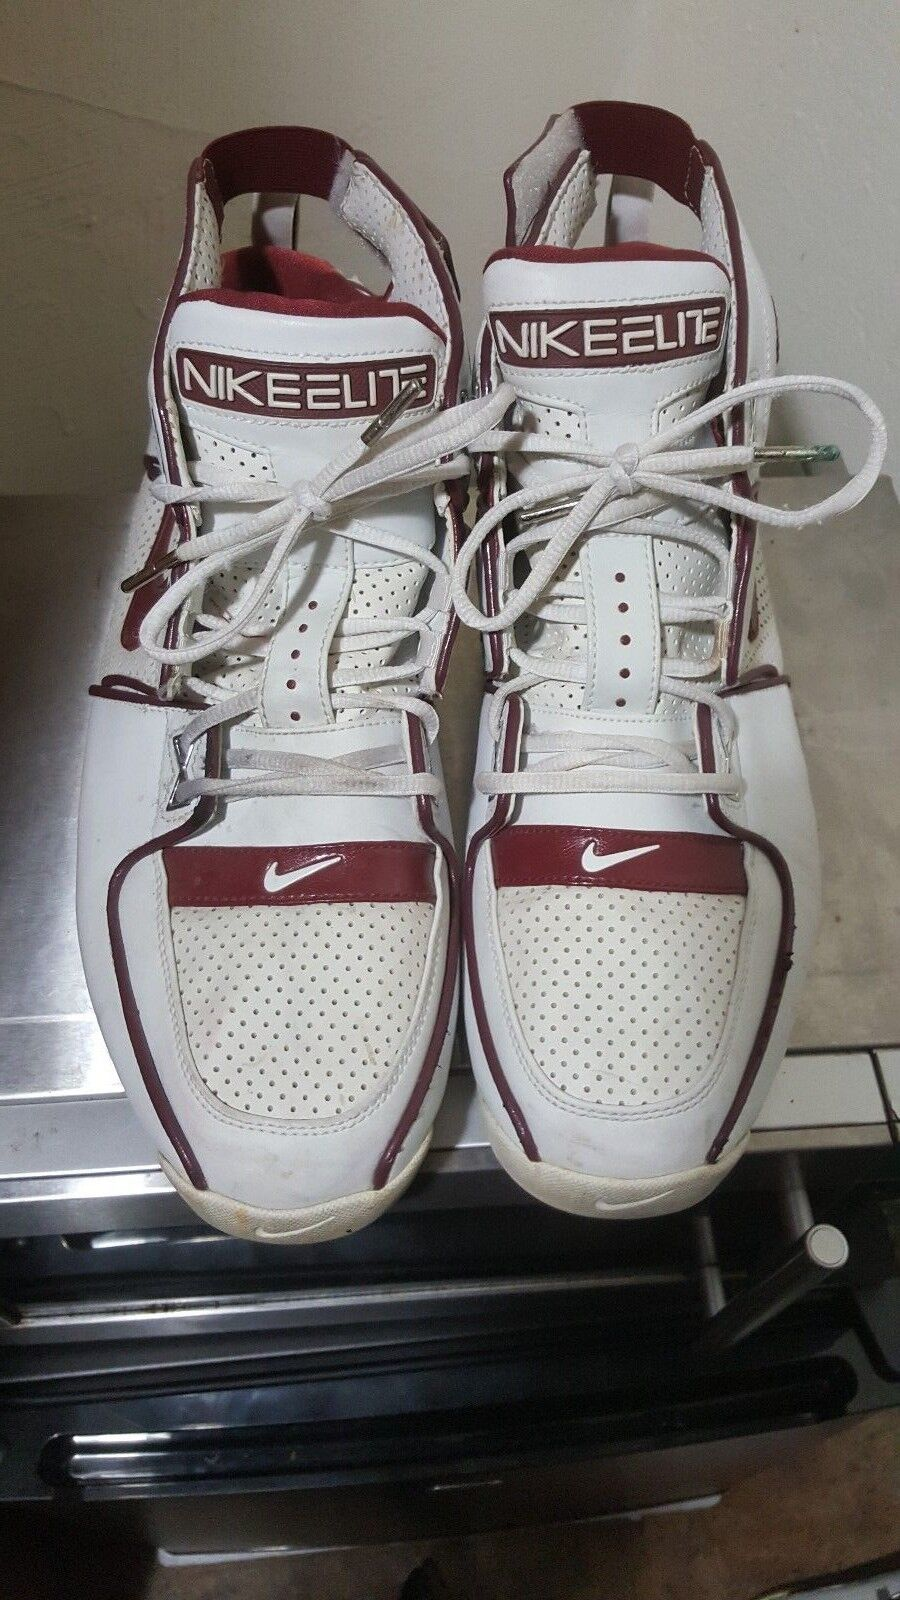 Nike Air pre Jordan pre Air owned reducción de precios con gran descuento e35146